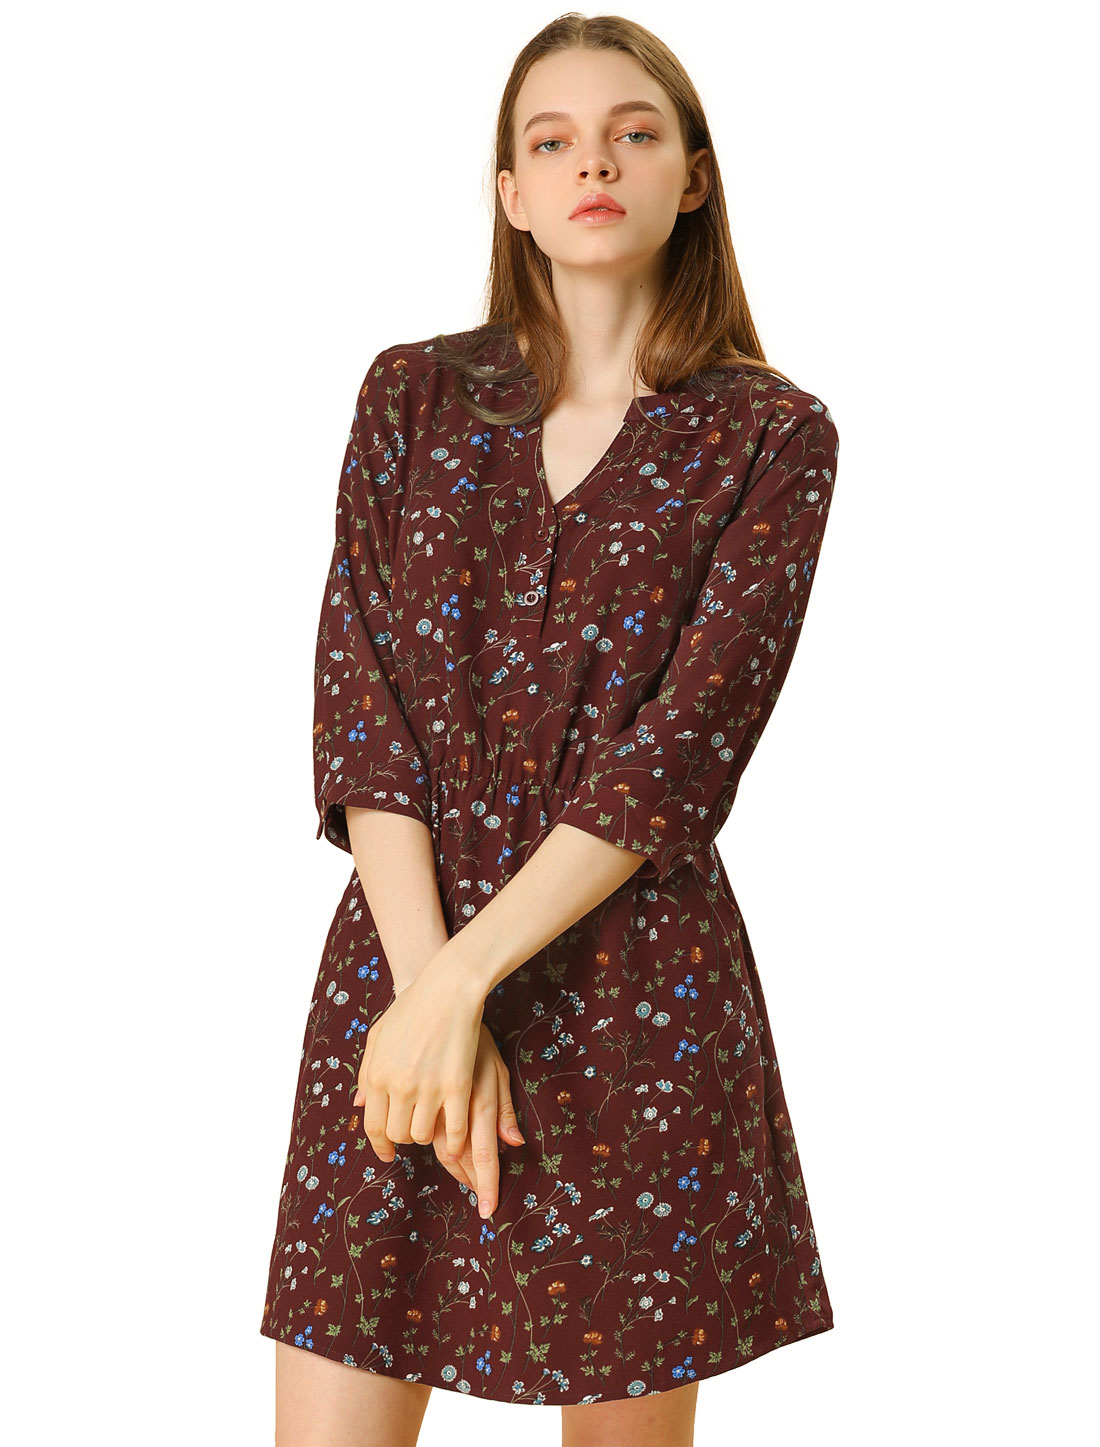 Allegra K Women Button Down V Neck Side Pockets Floral Dress Purplish Red M